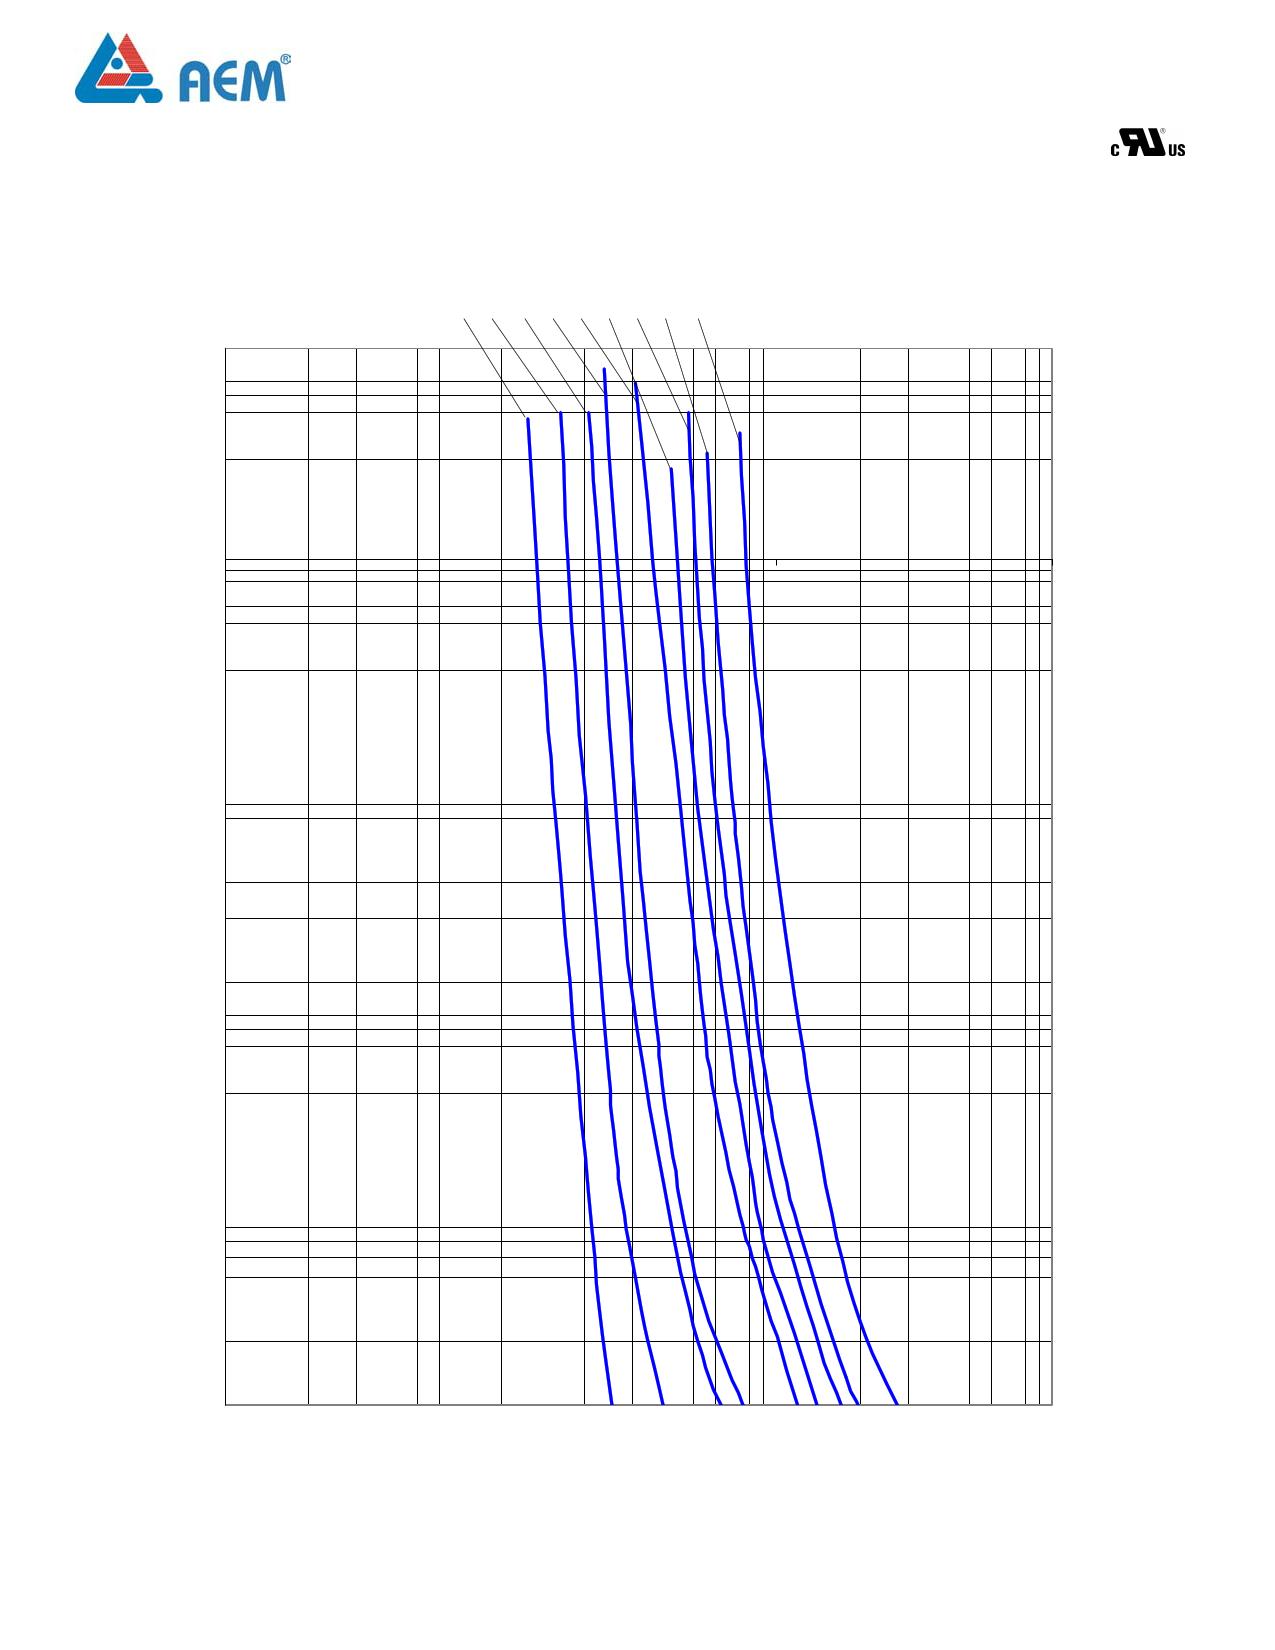 F0402FA0750V024T arduino